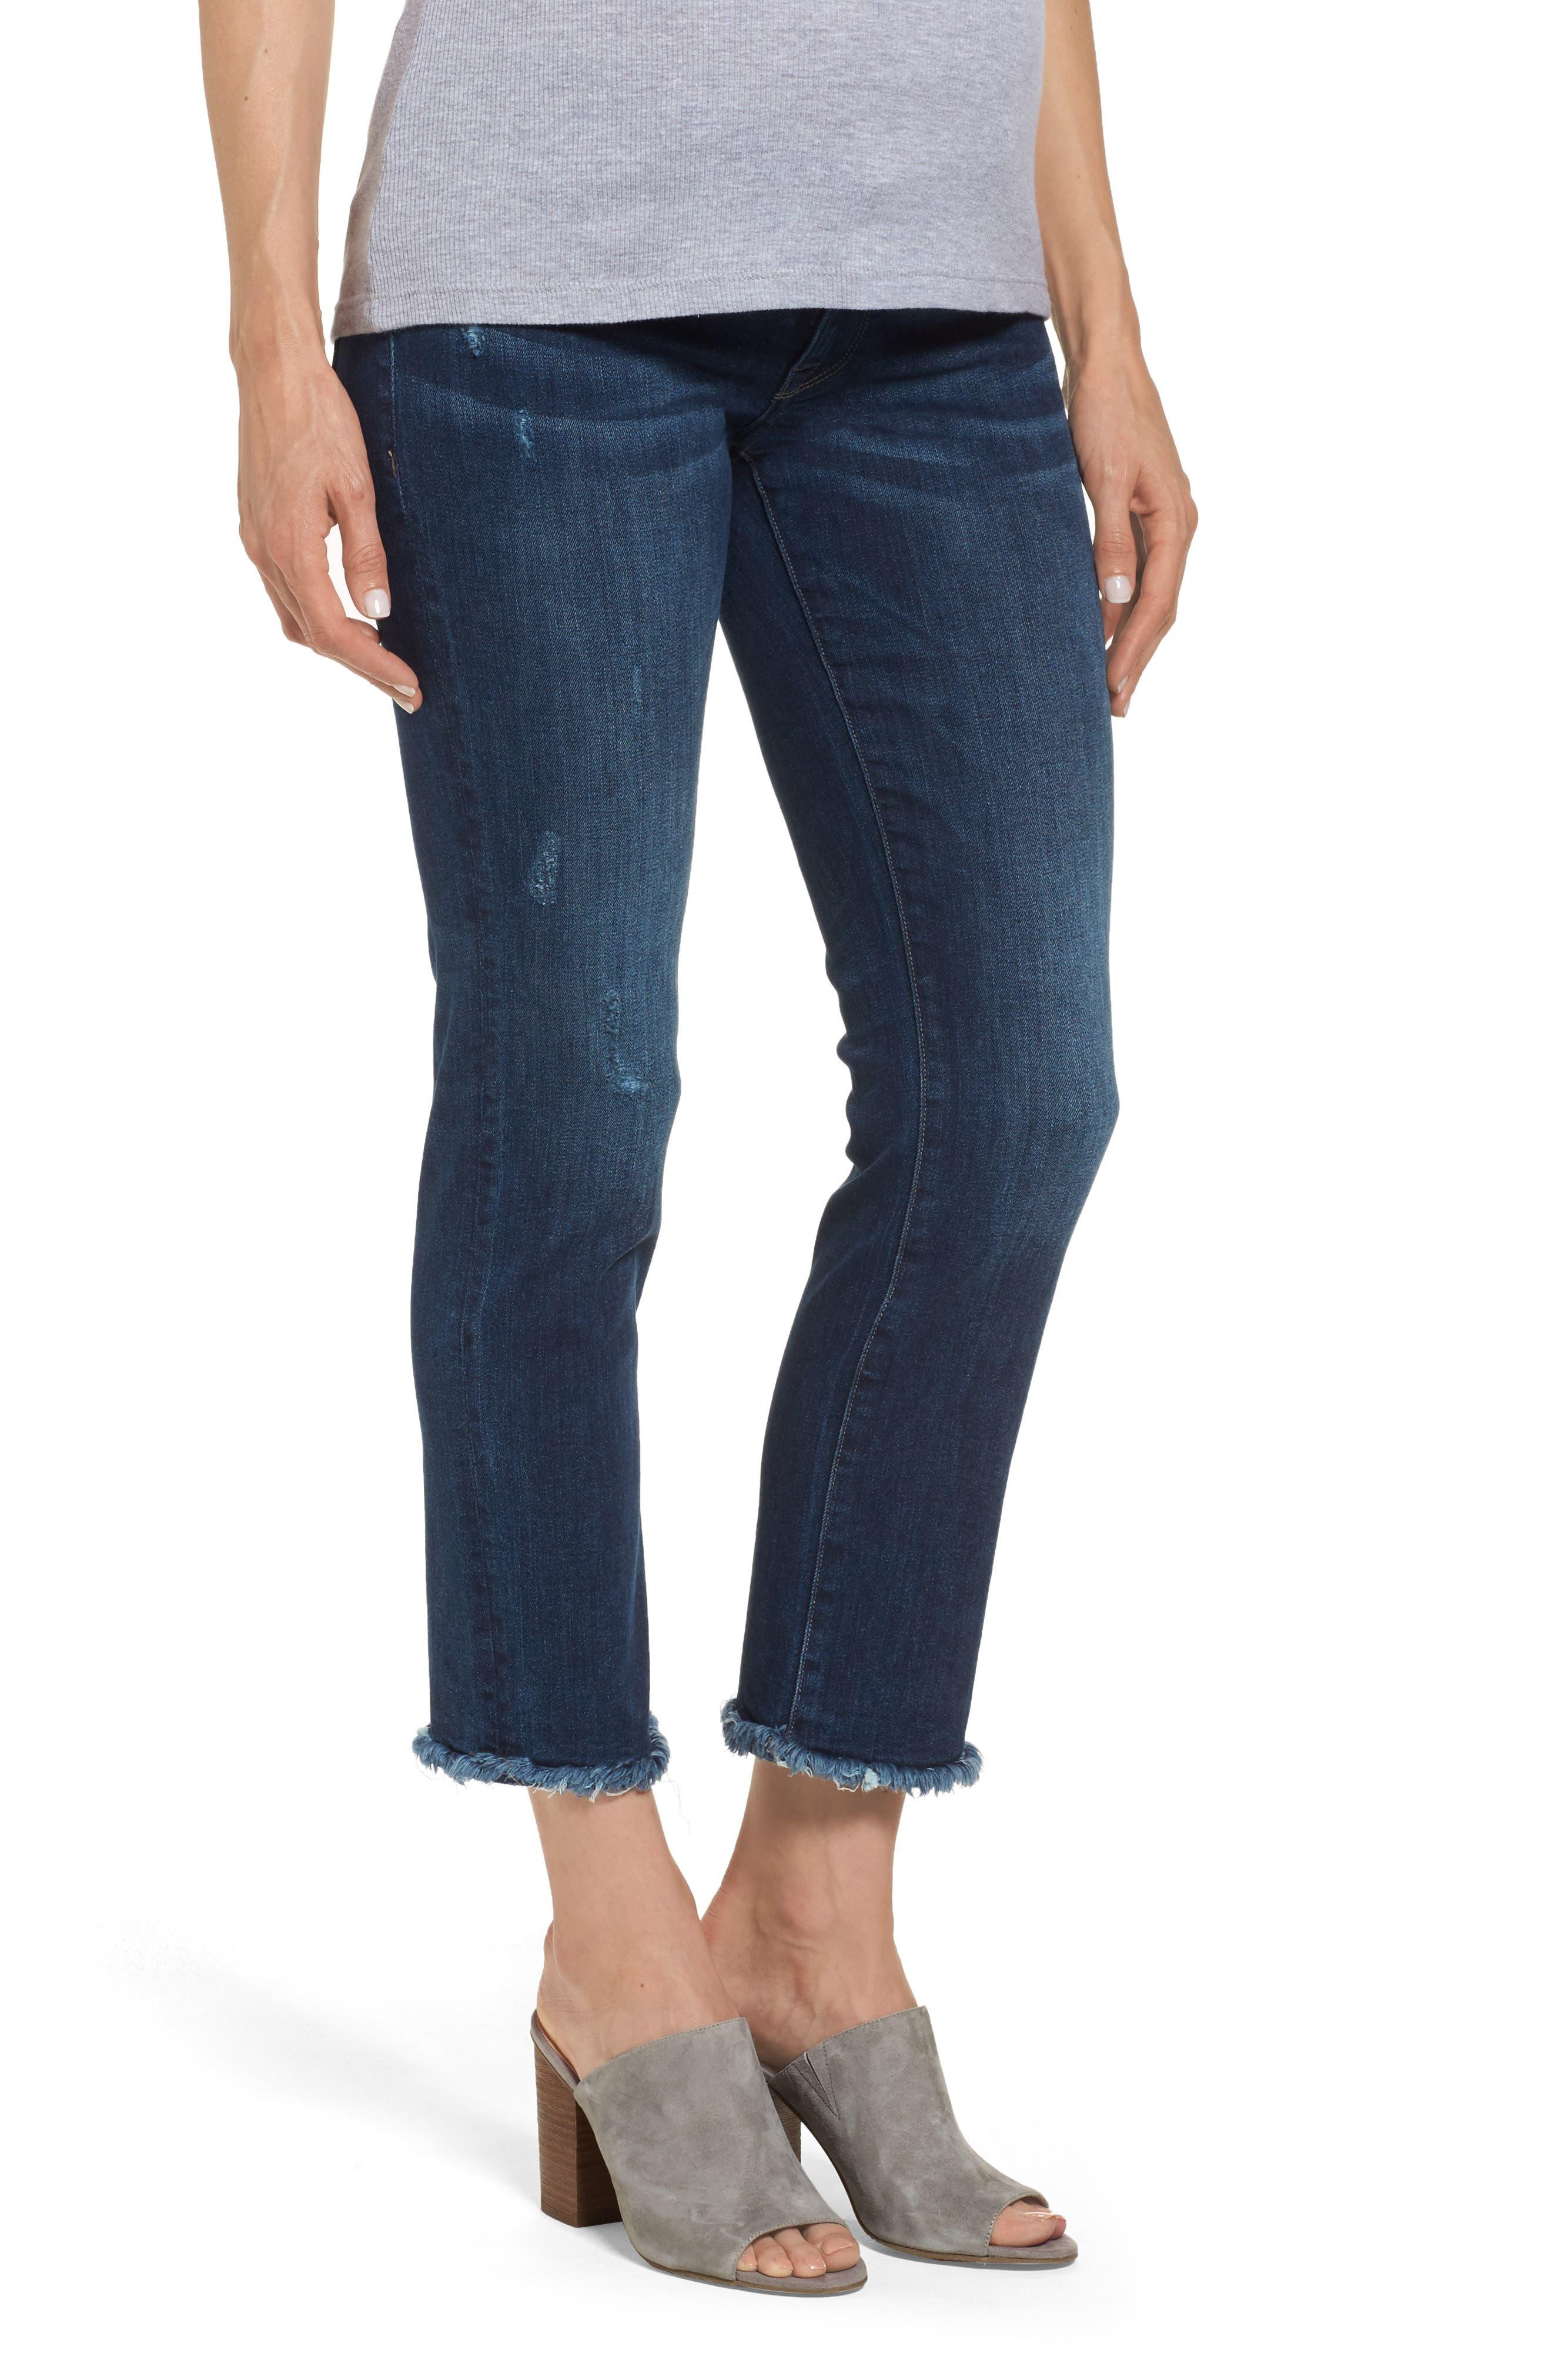 Mara Maternity Ankle Jeans,                             Alternate thumbnail 3, color,                             405